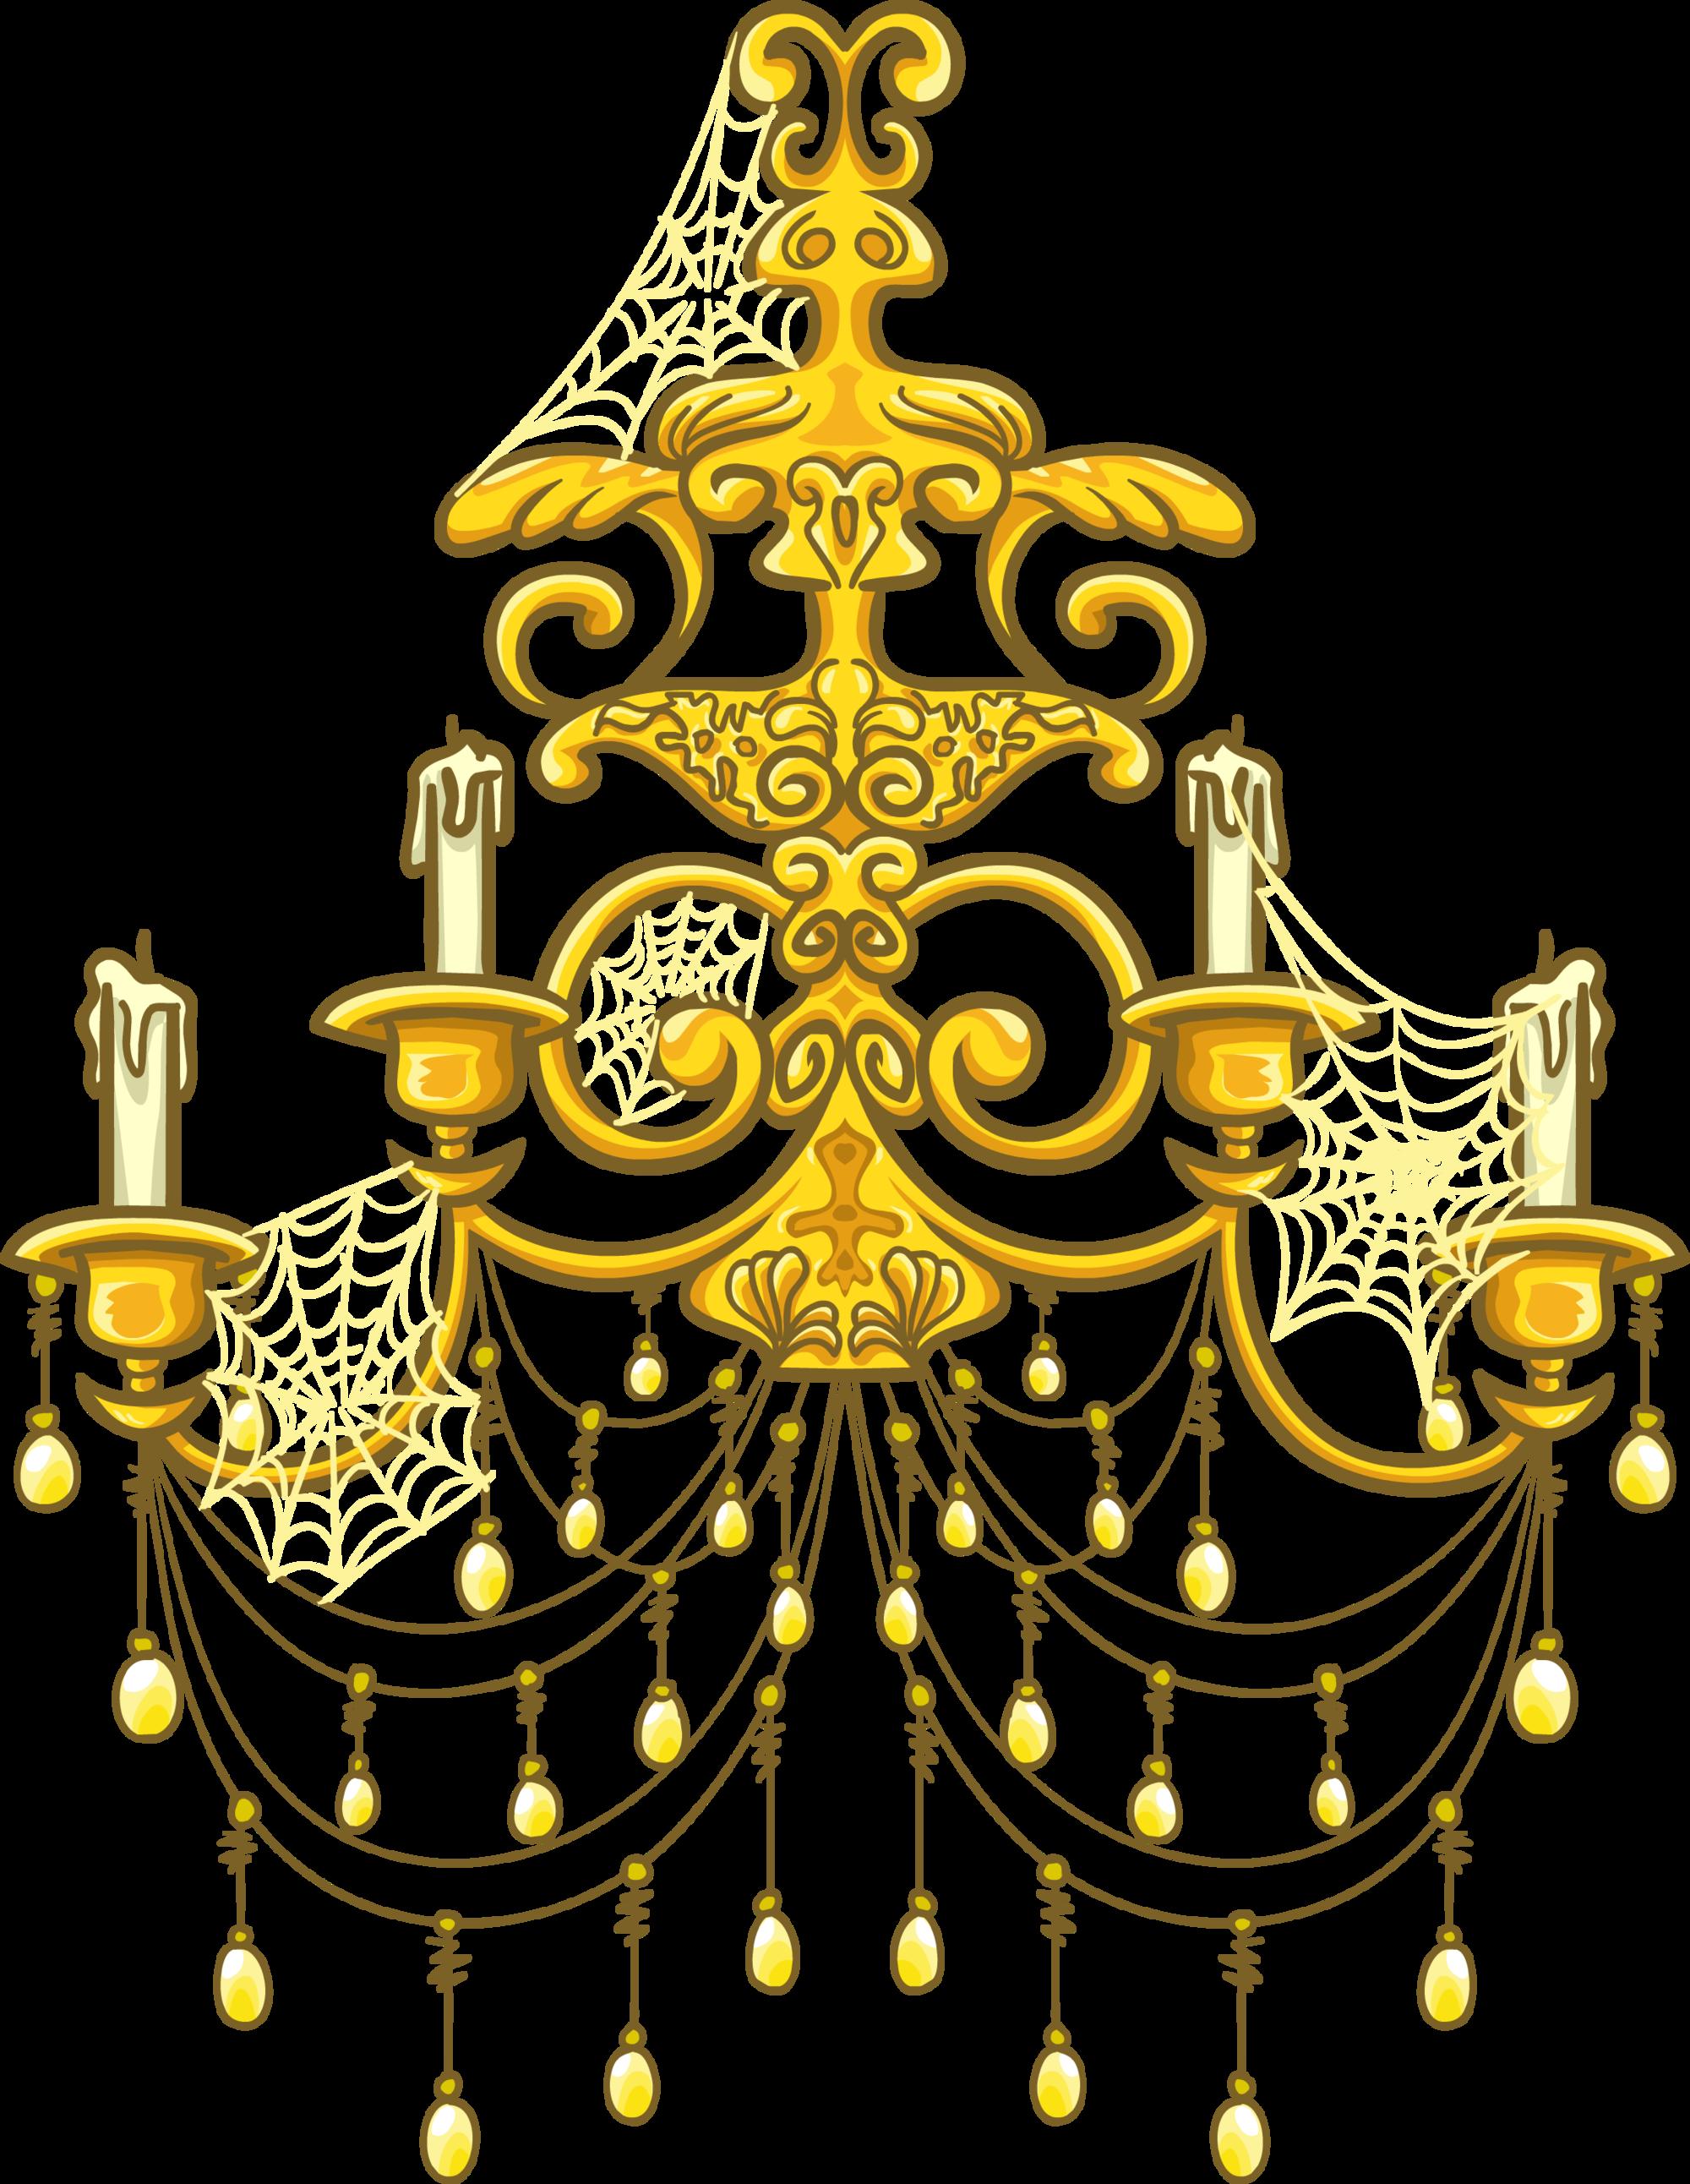 clip art free download Chandelier clipart golden chandelier. Image gold sprite png